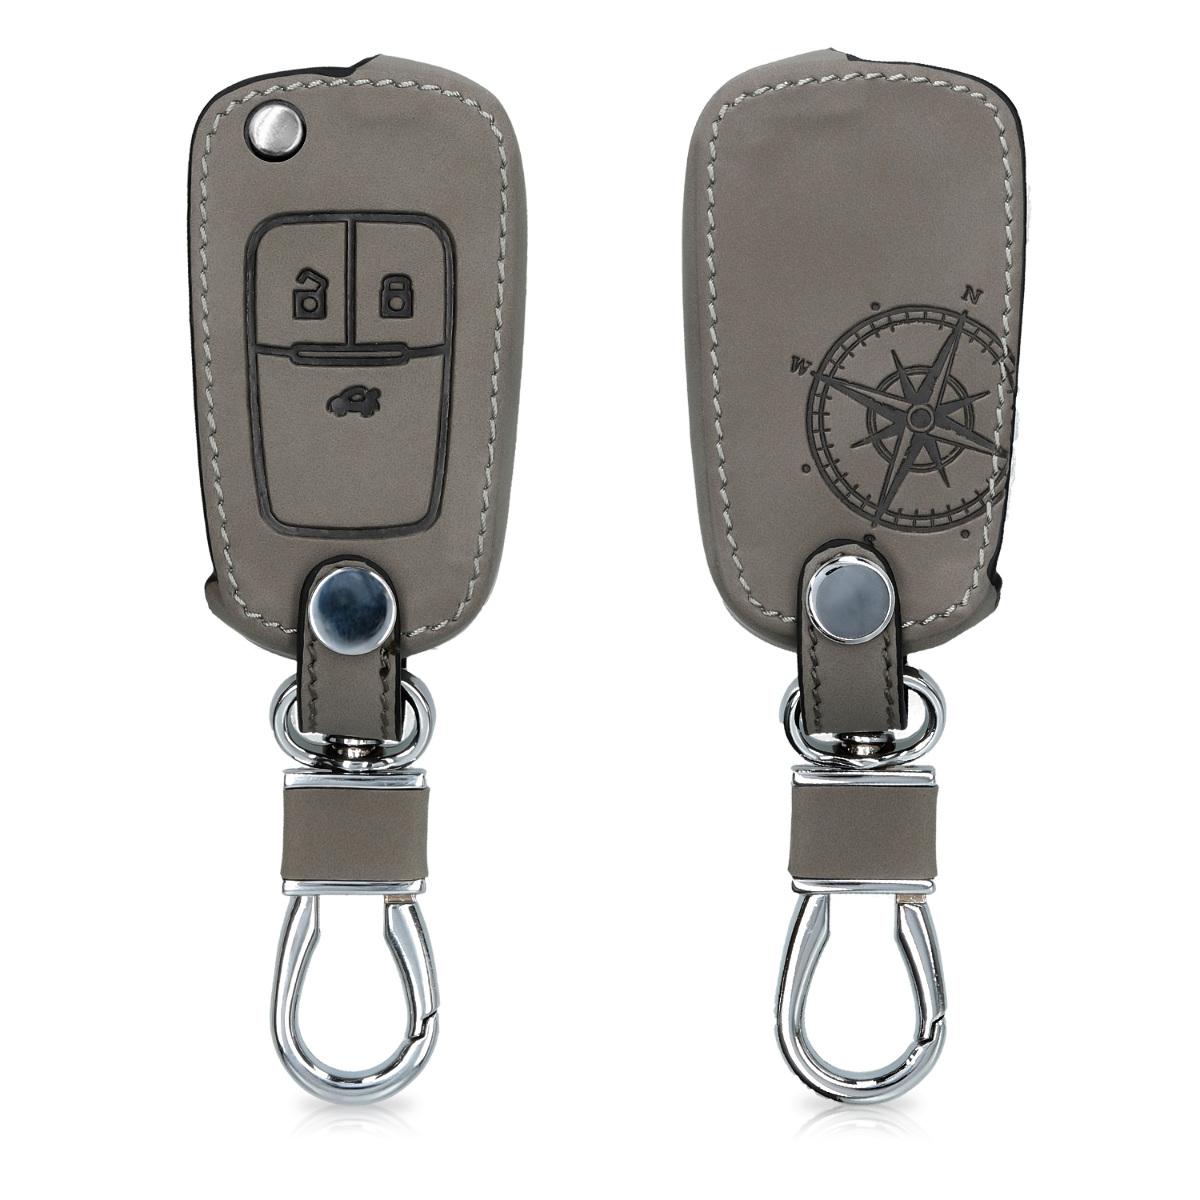 KW Θήκη Κλειδιού Opel / Chevrolet - Συνθετικό Δέρμα - 3 Κουμπιά - Grey (49942.01)